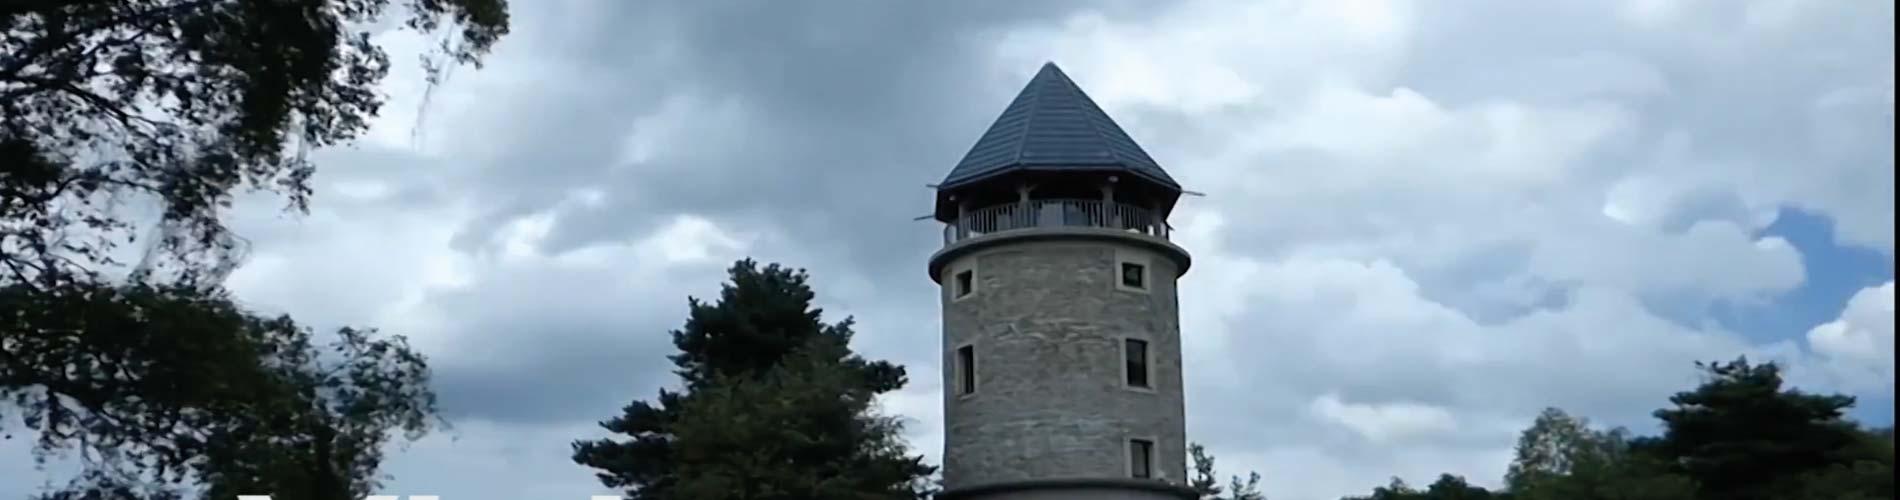 La Tour Matagrin inaugure….